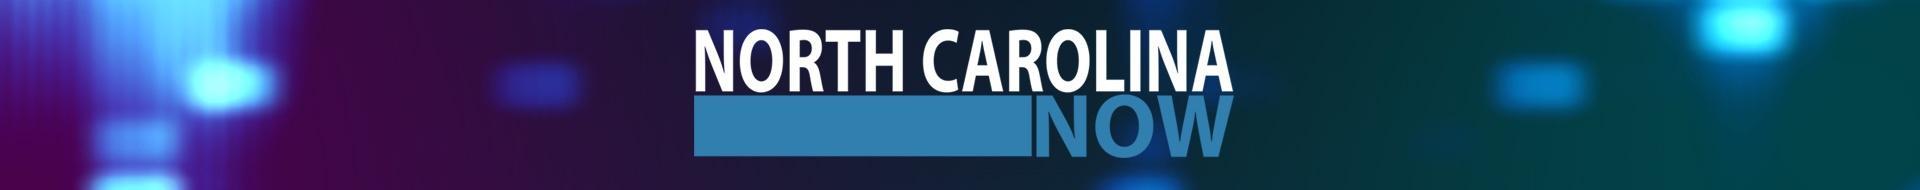 North Carolina Now